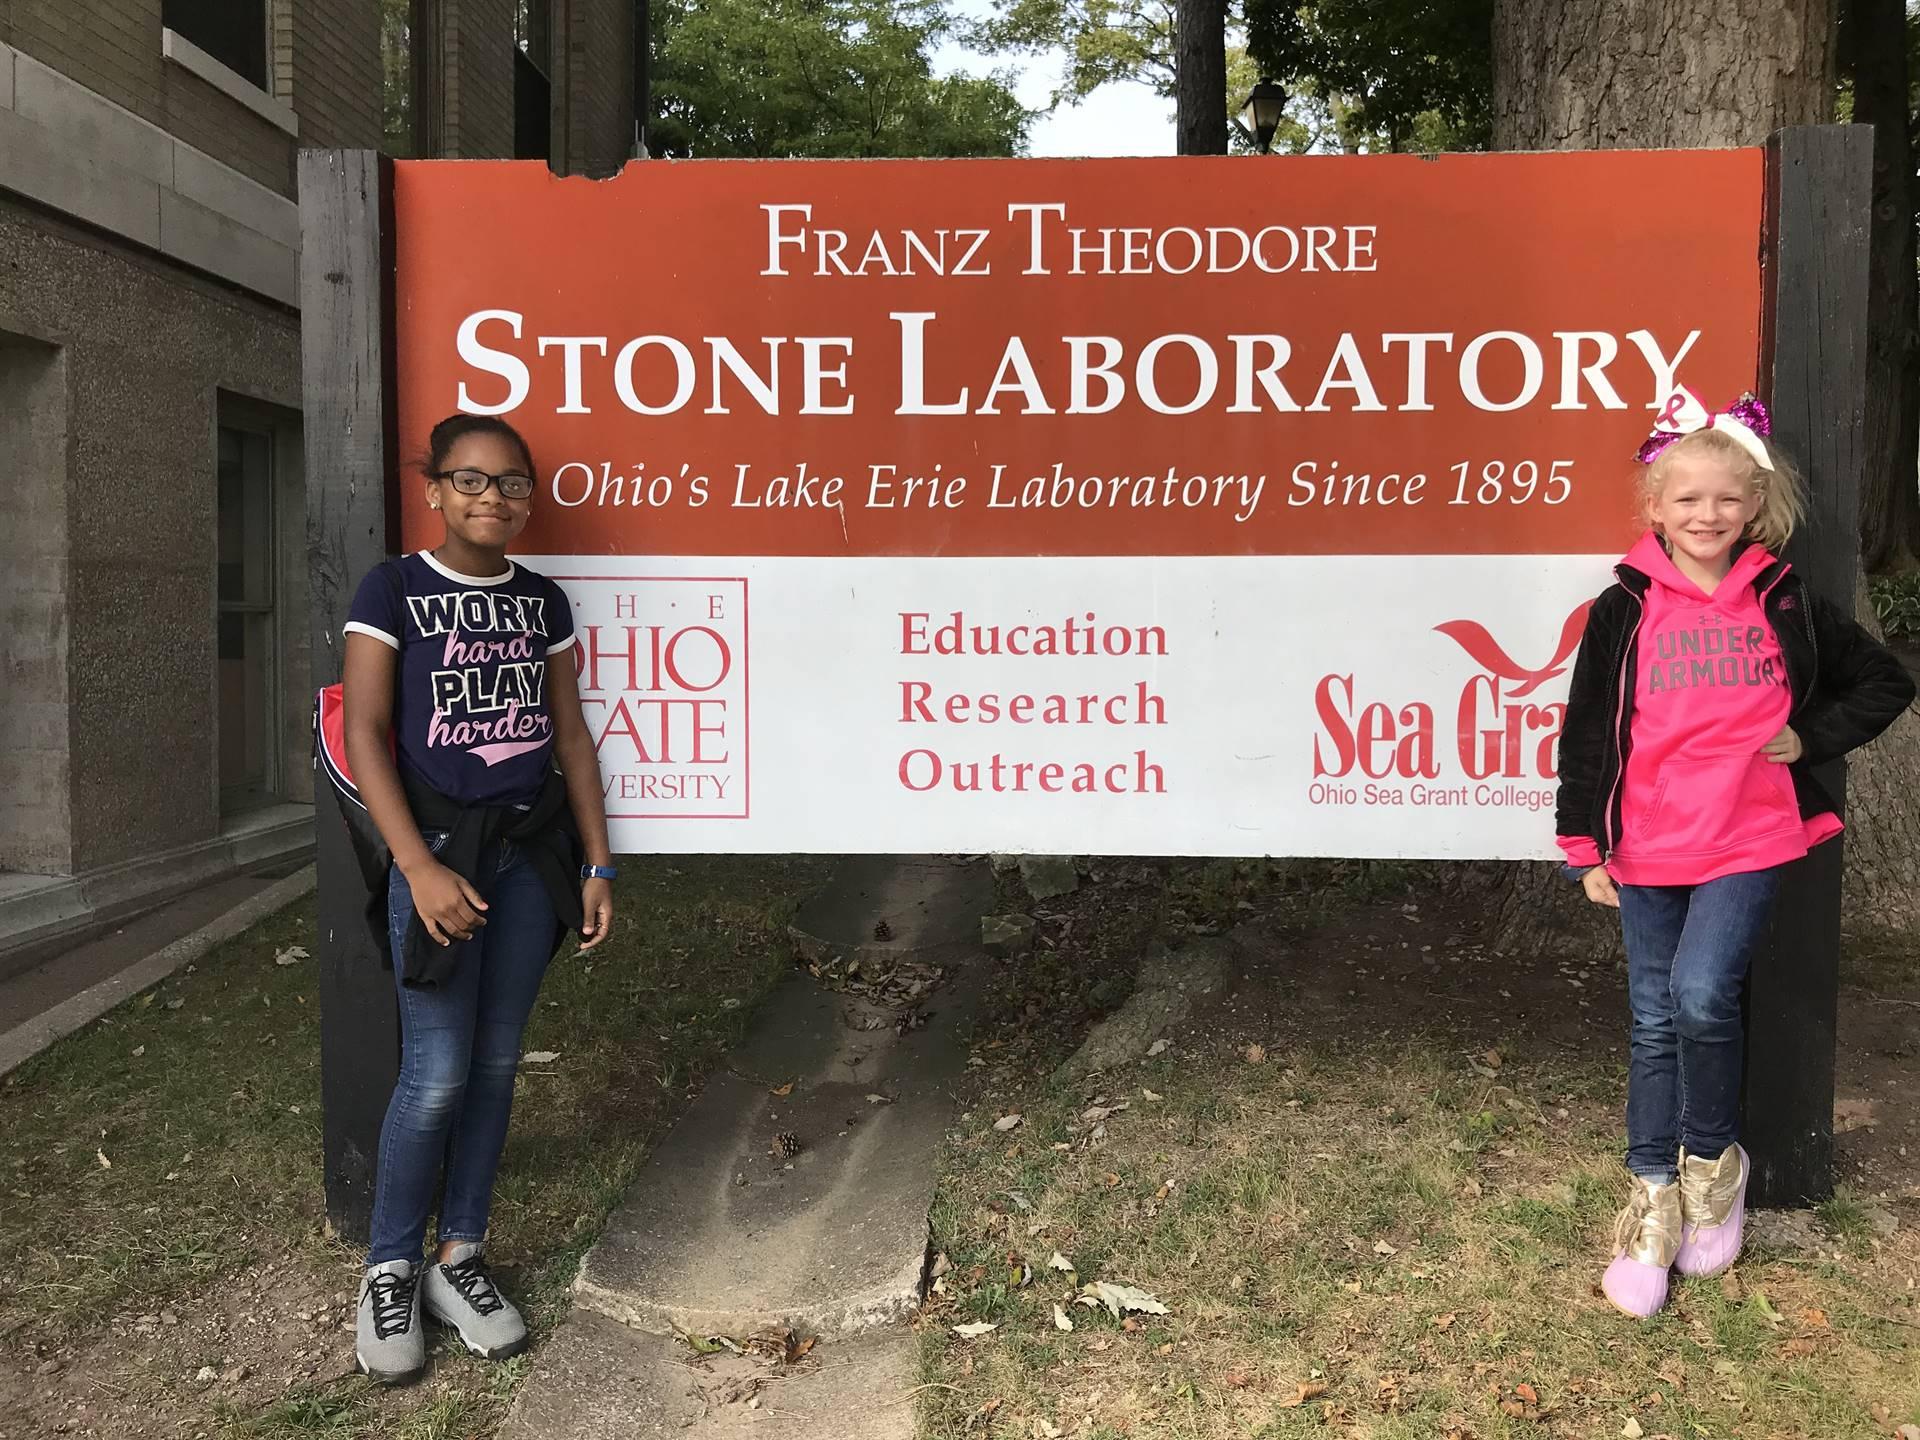 Stone Laboratory